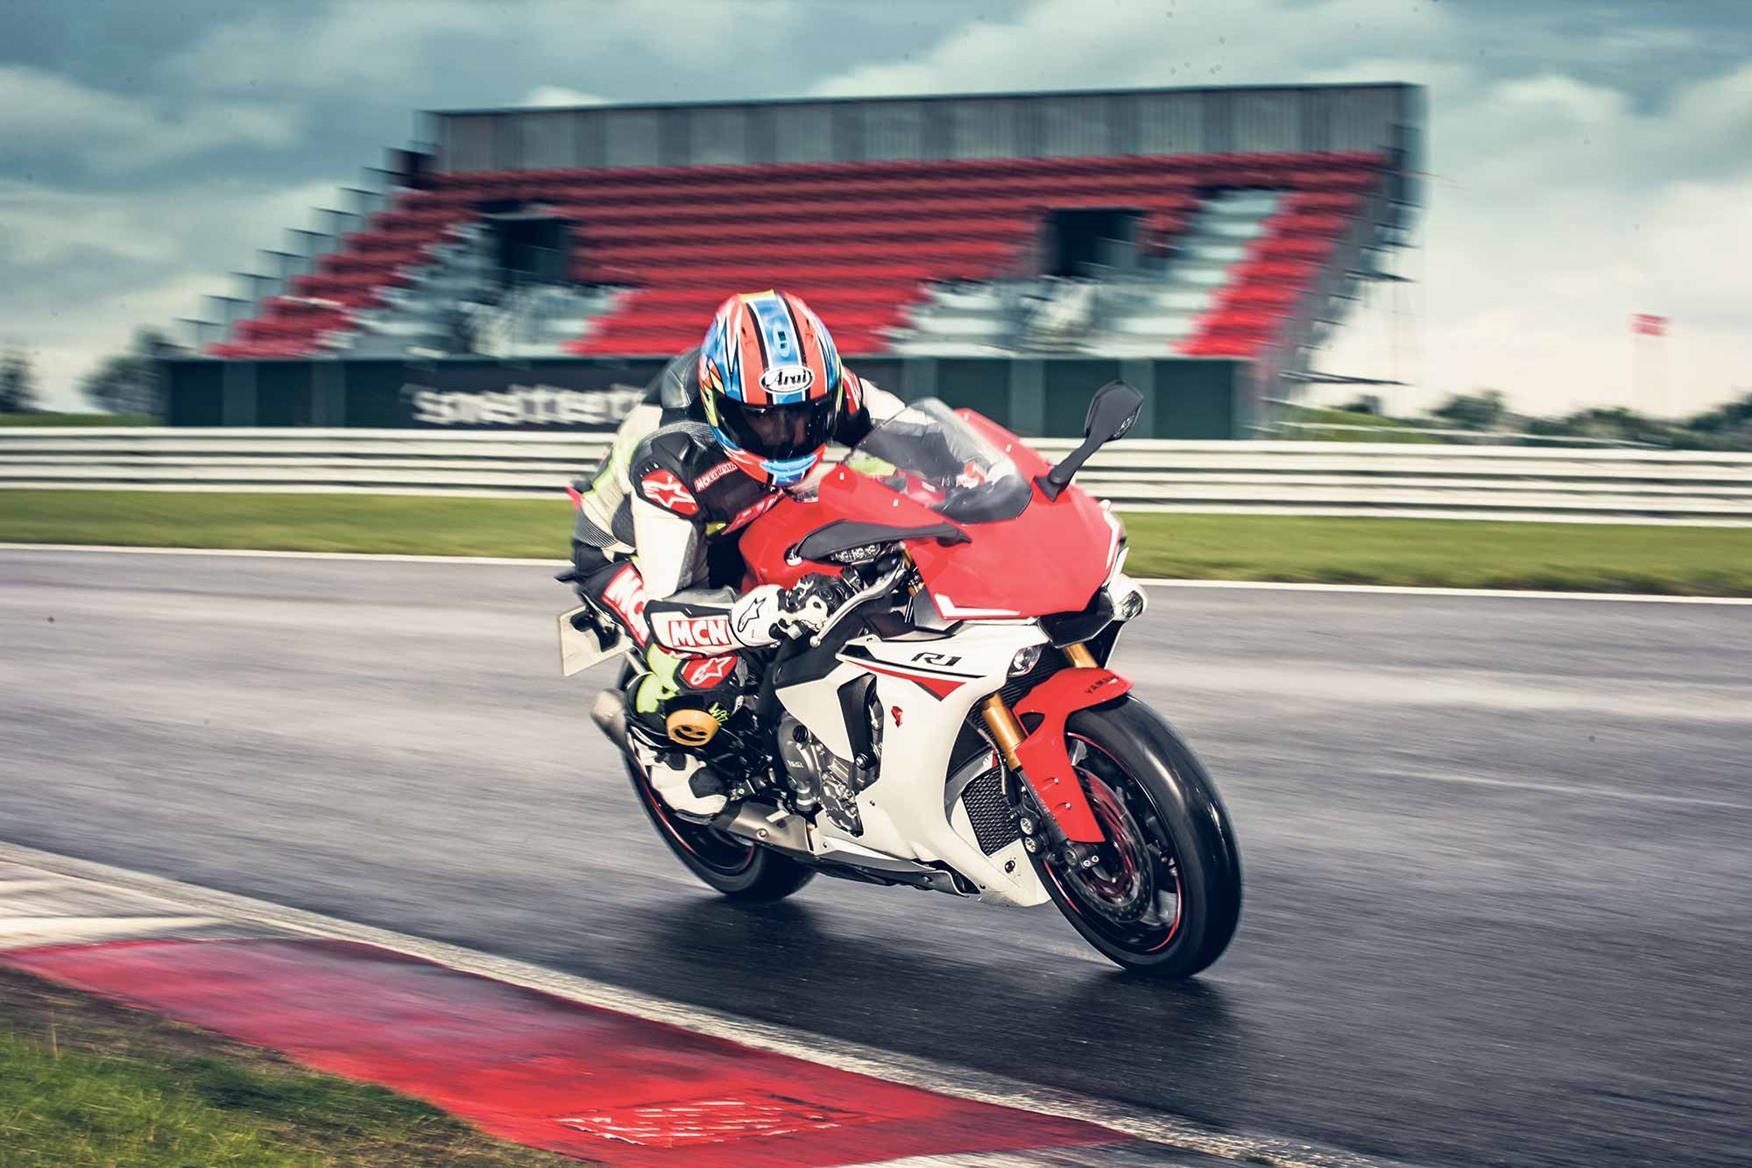 2015 Yamaha R1 on track